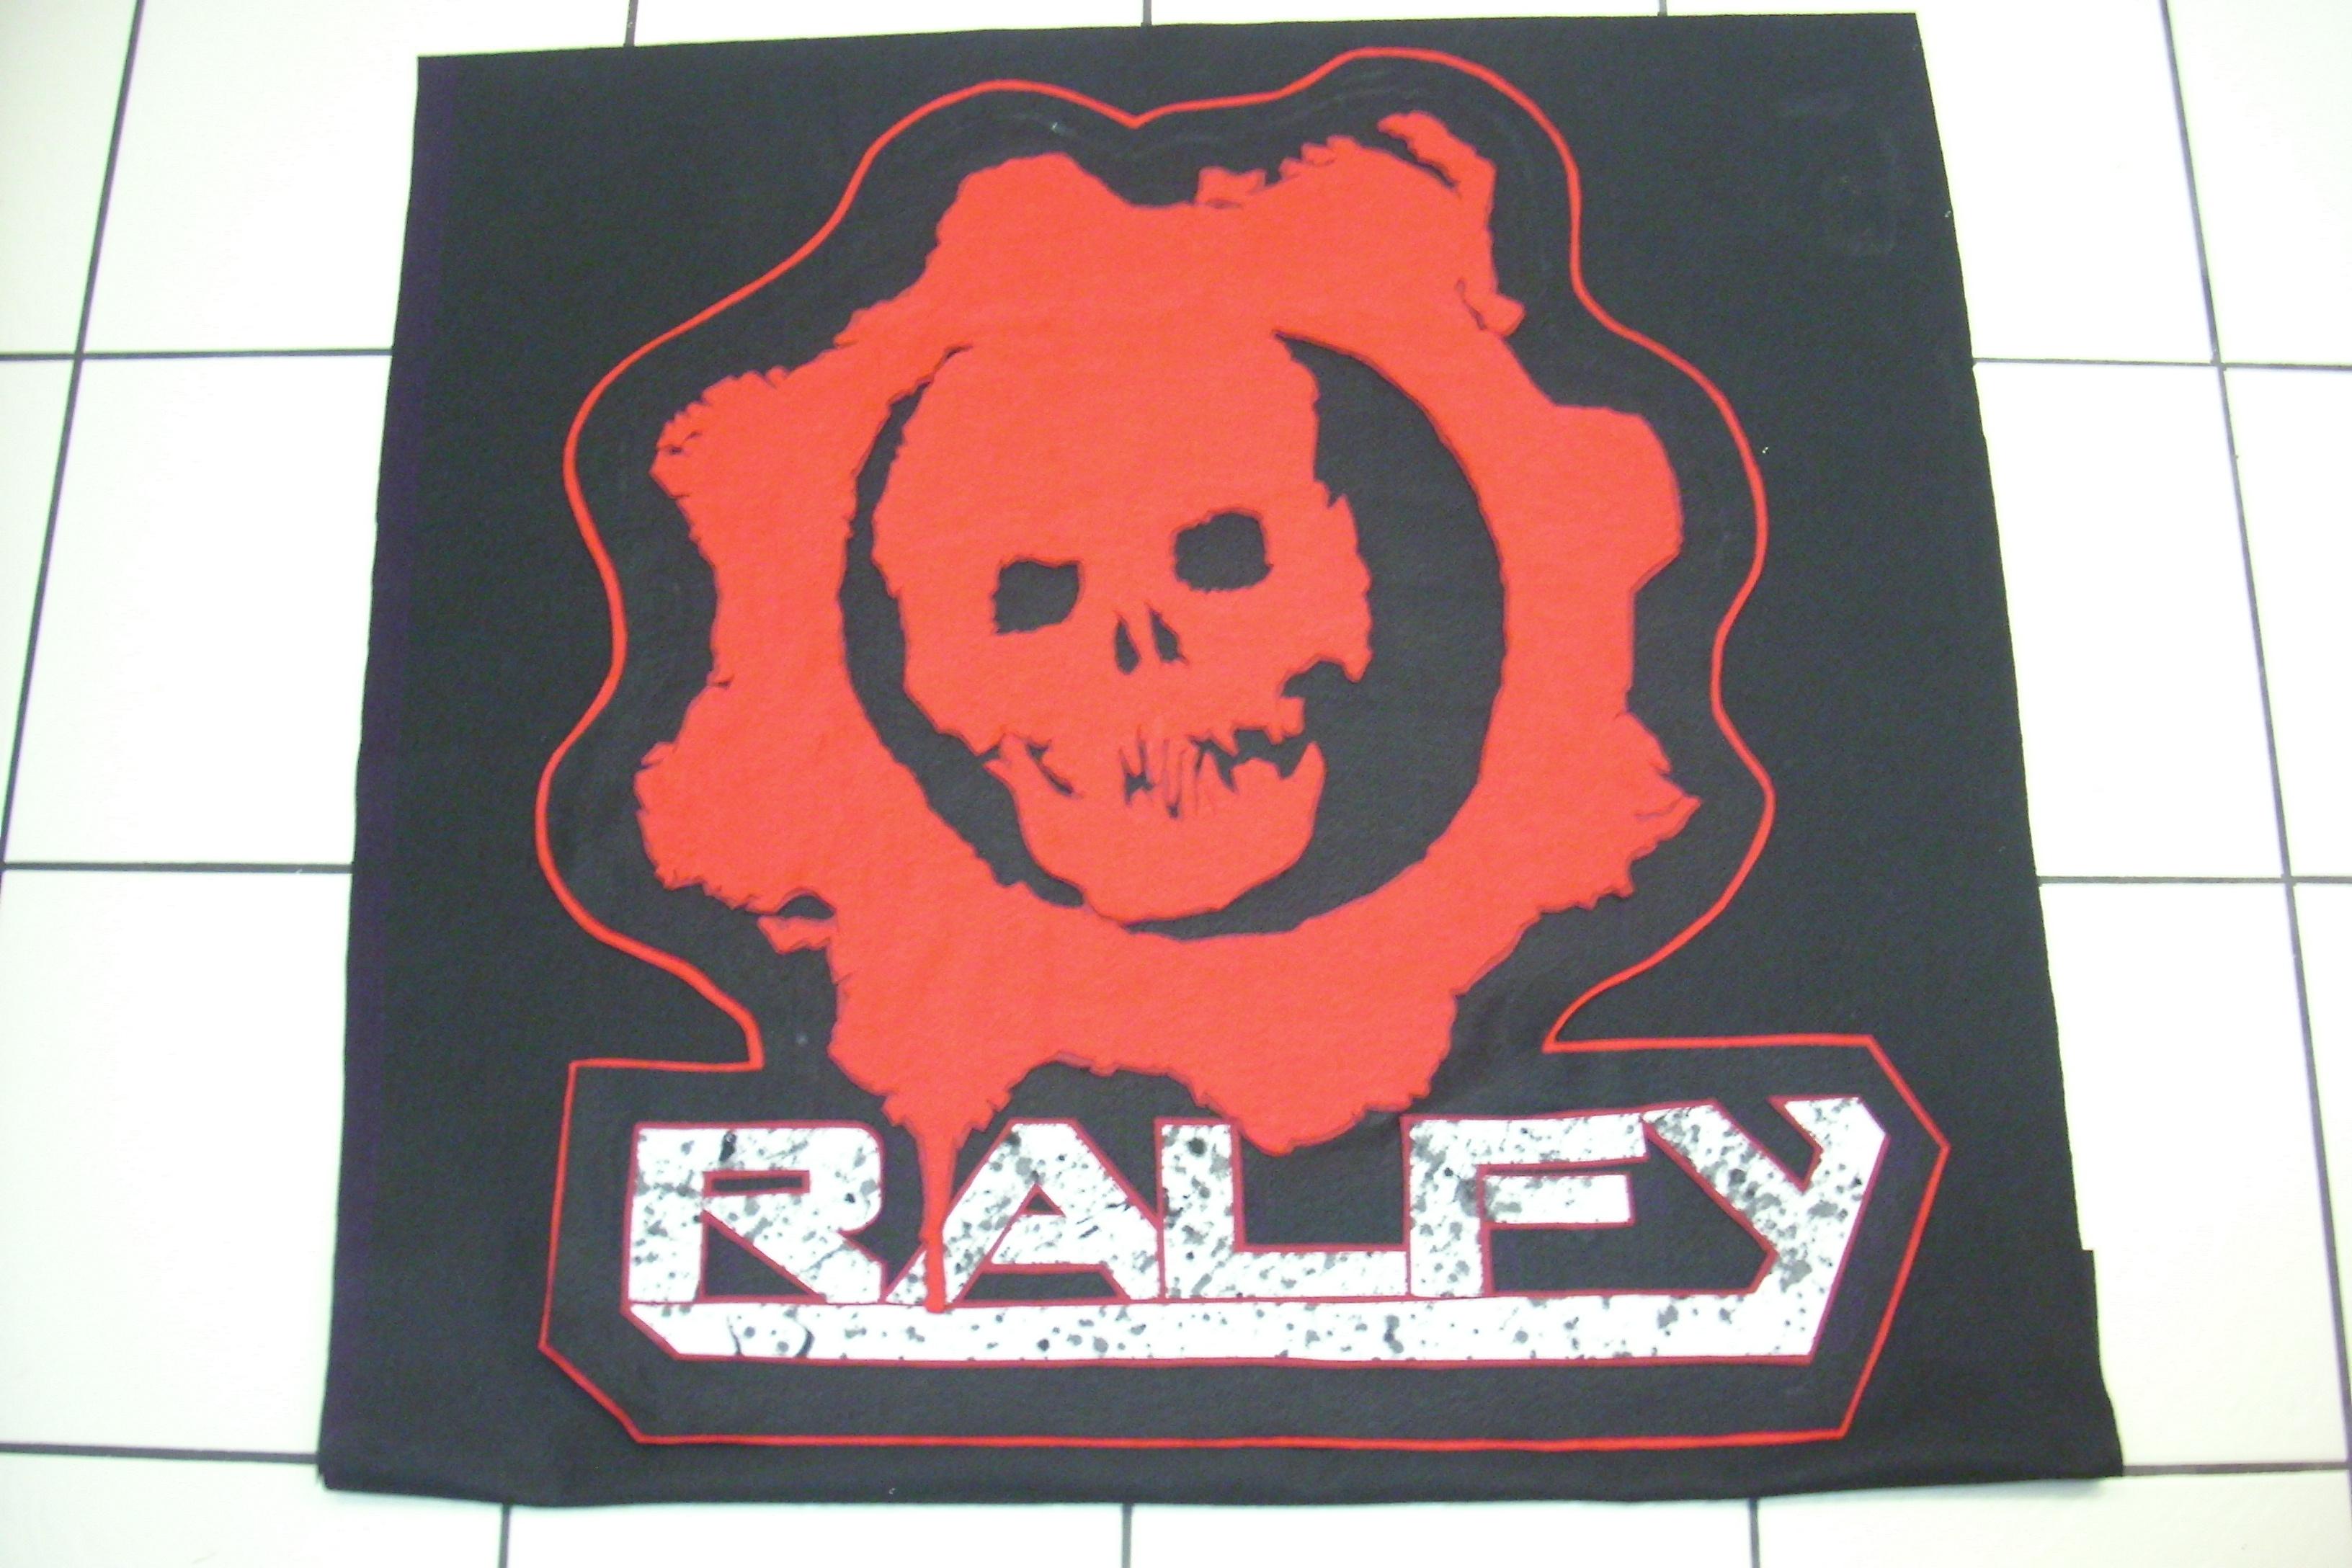 Ralfy